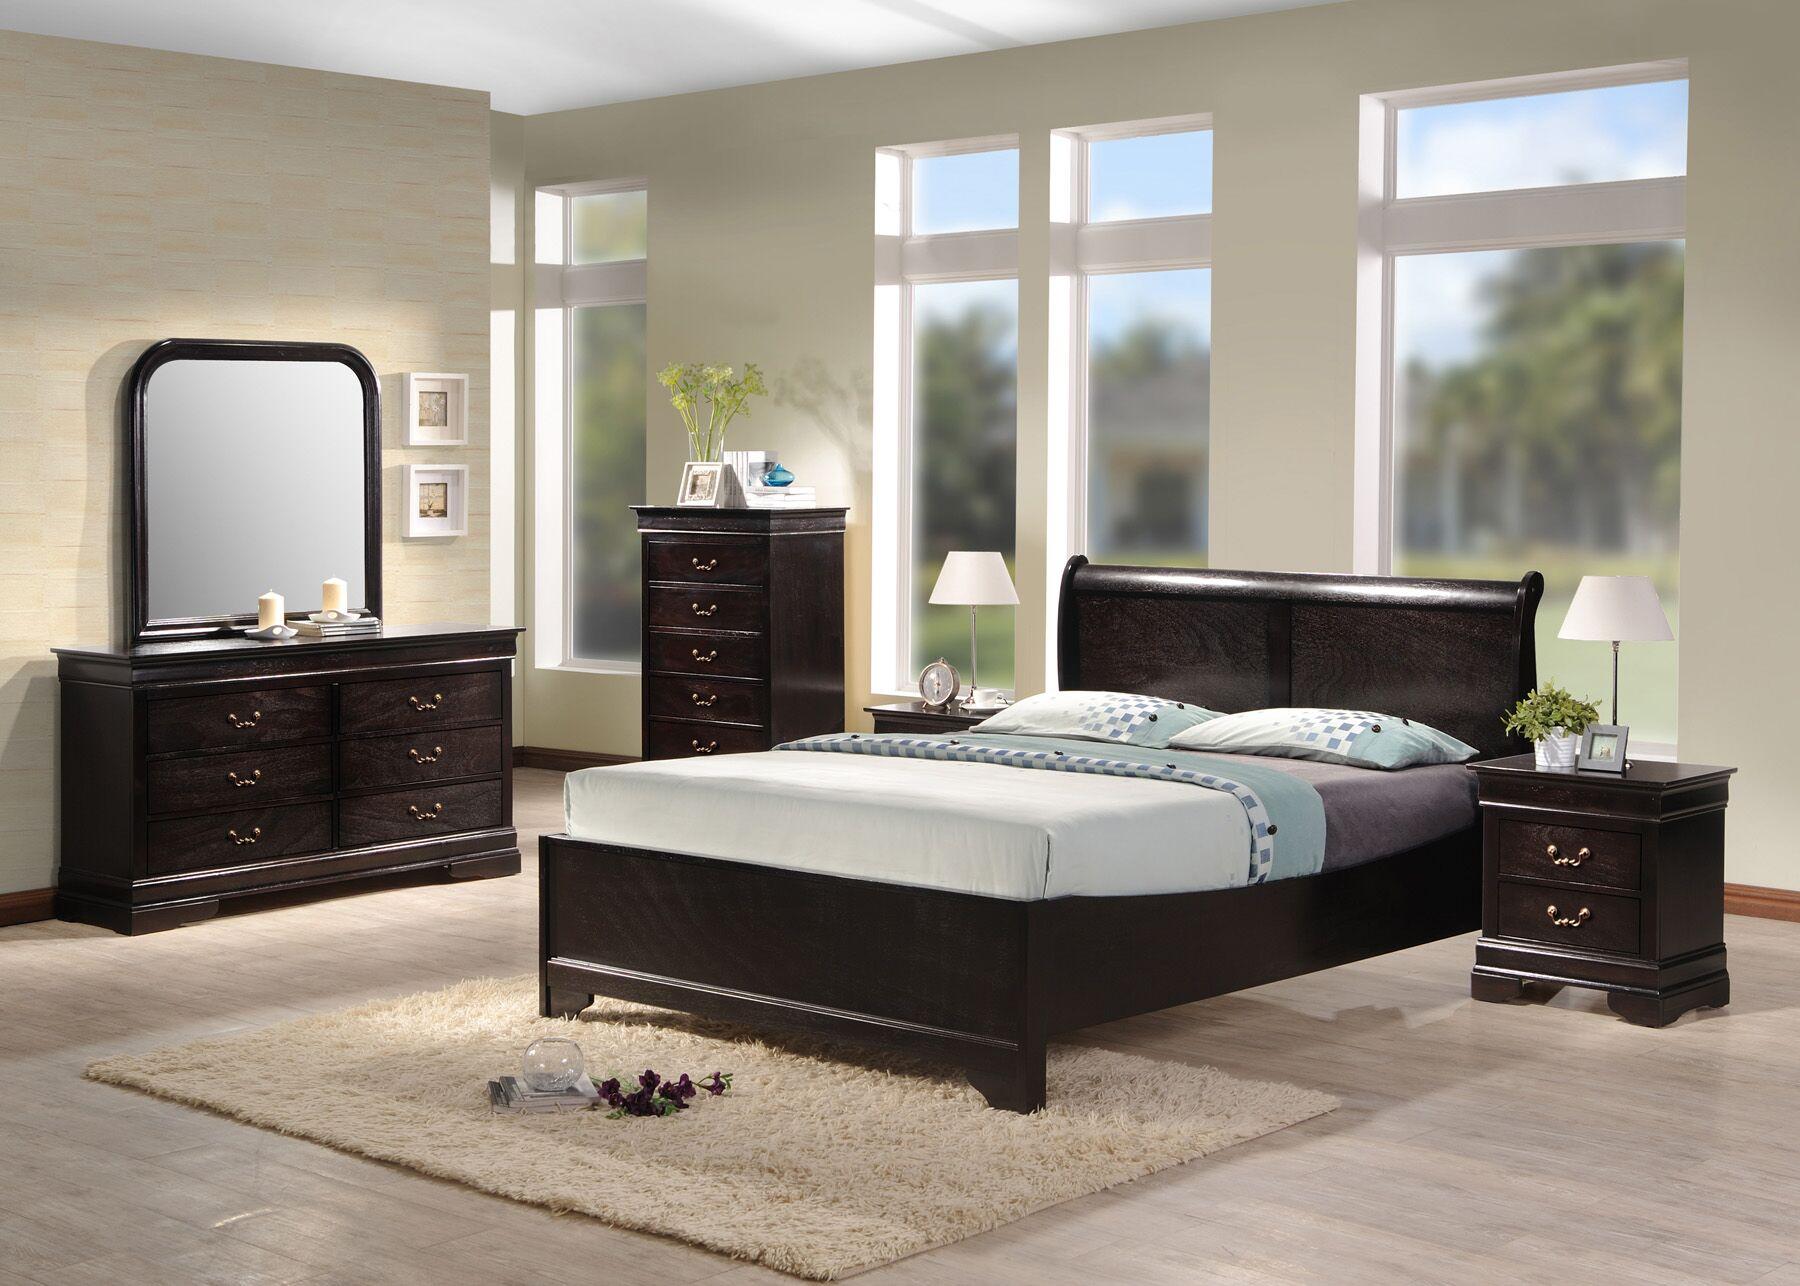 Apolonio Panel 4 Piece Bedroom Set Bed Size: Queen